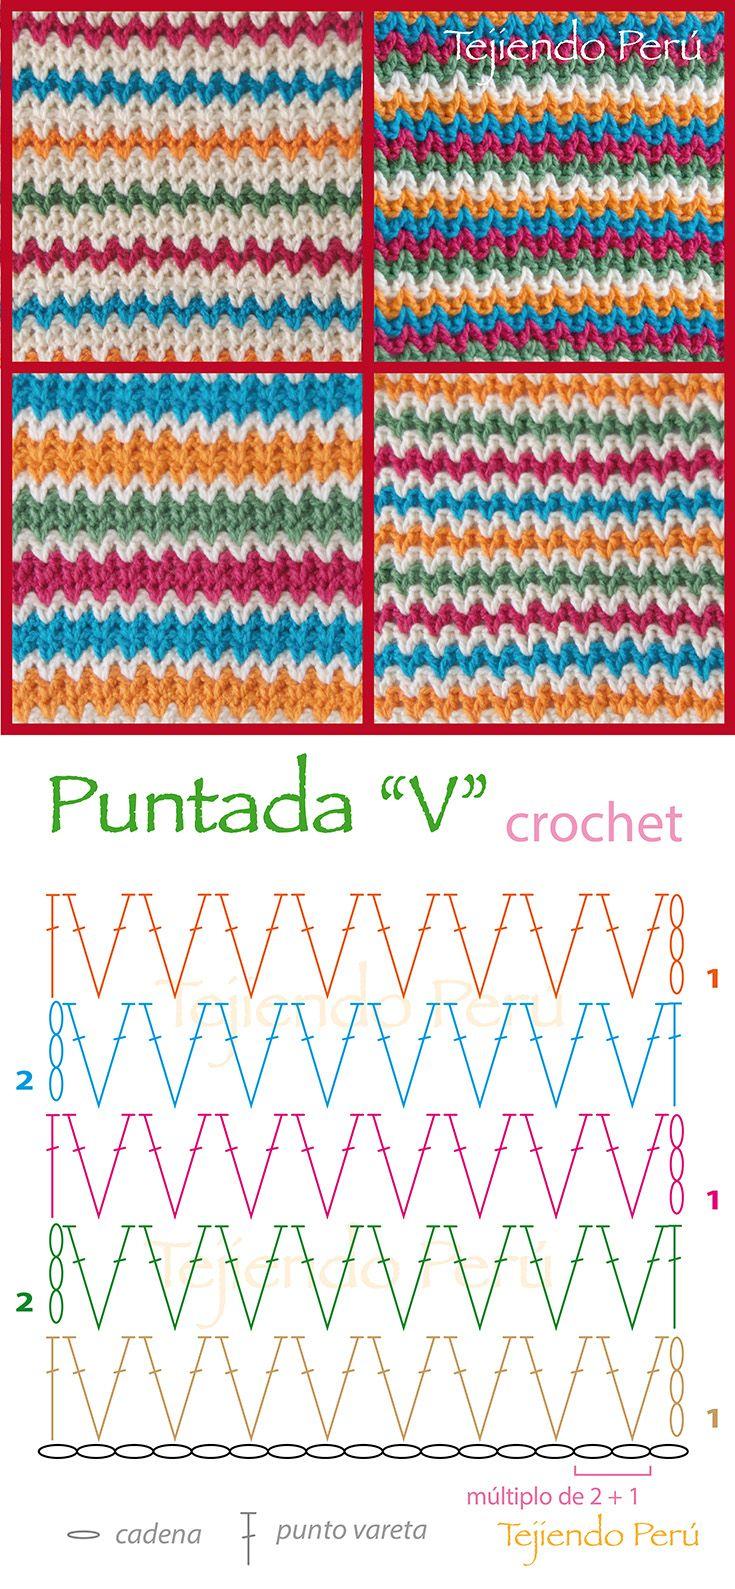 Puntada V o V stitch tejida a crochet: diagrama! Pueden hacer miles ...